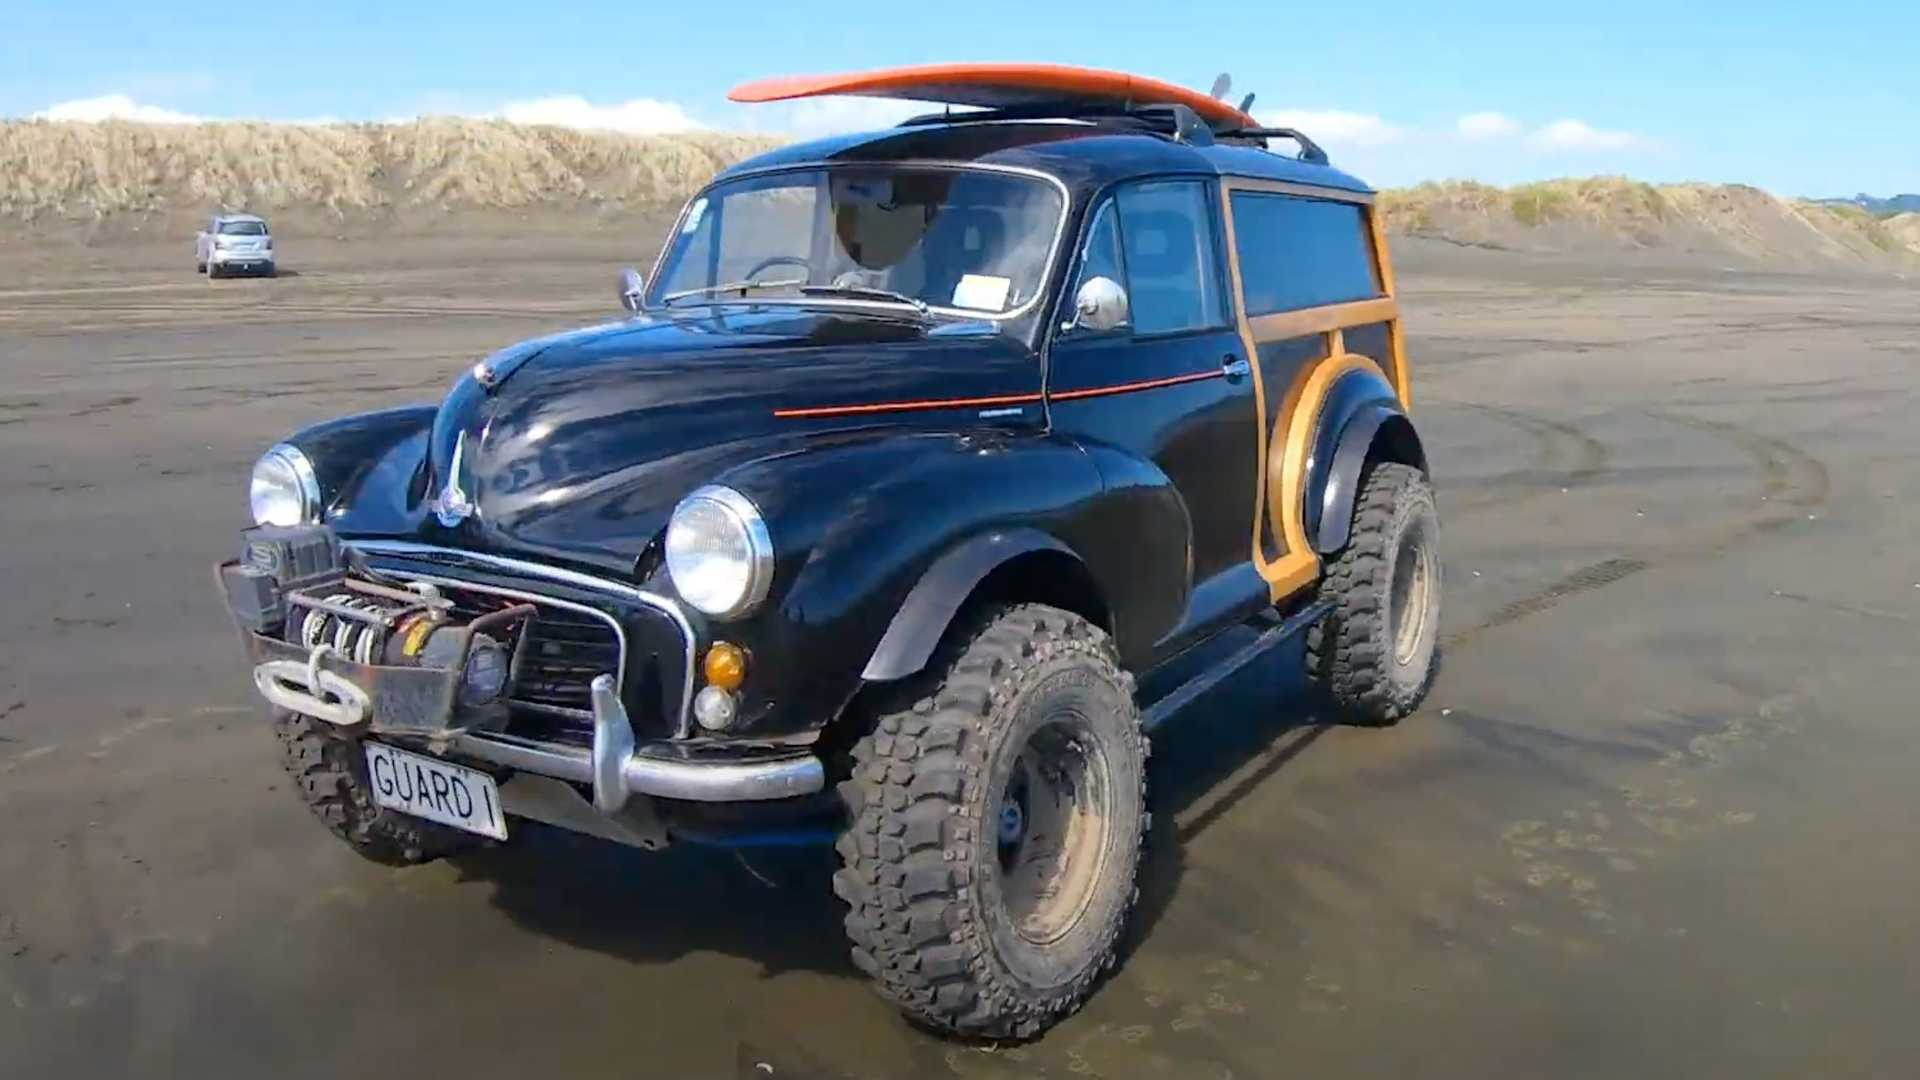 Morris Minor Off-Roader Is Actually A Suzuki Vitara Underneath